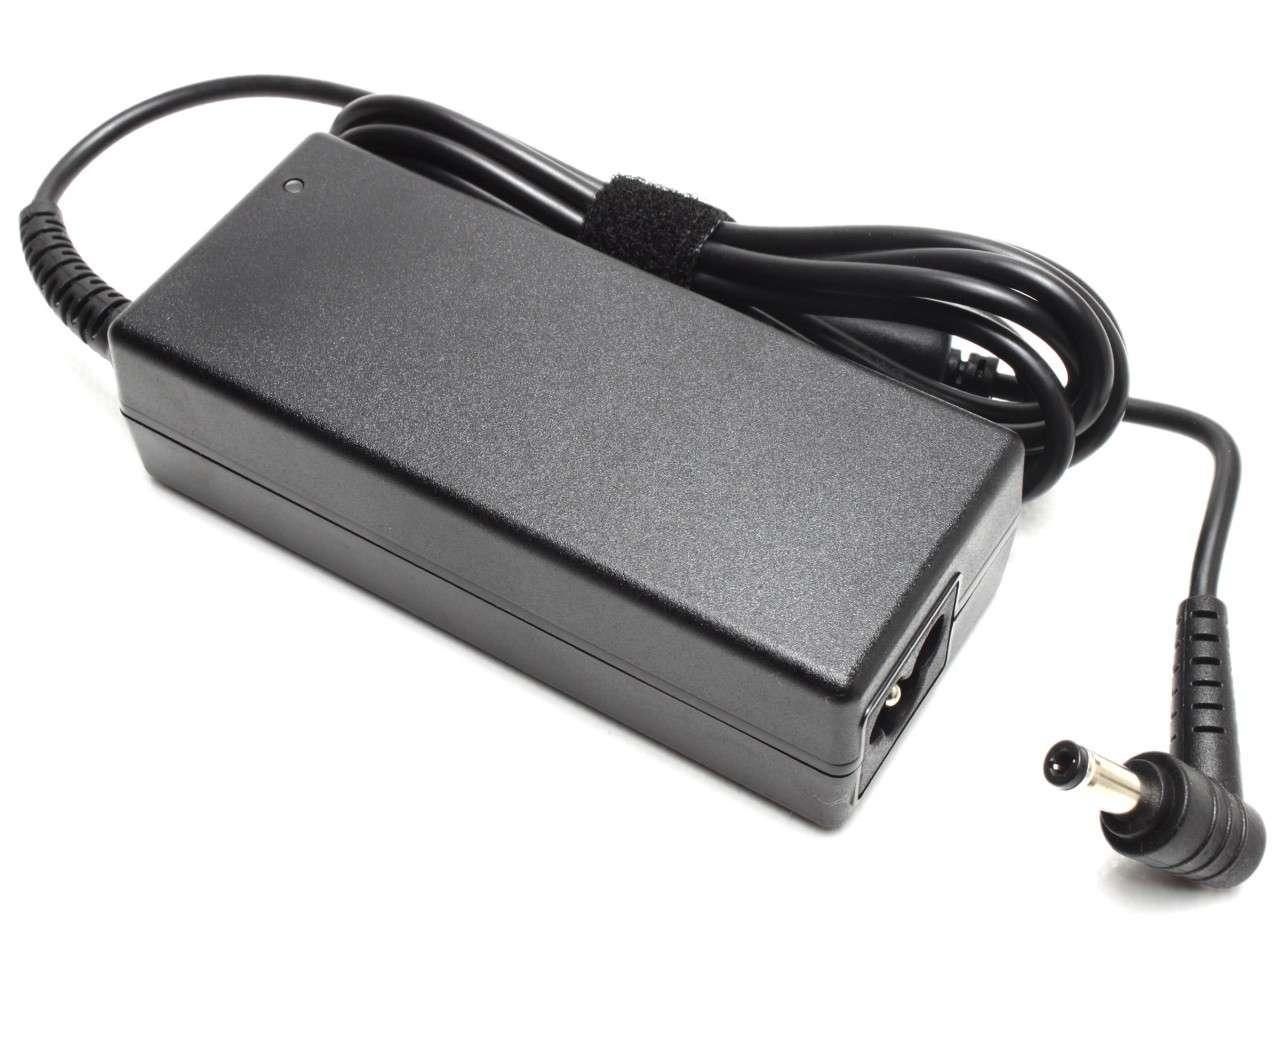 Incarcator Advent 4480DVD imagine powerlaptop.ro 2021